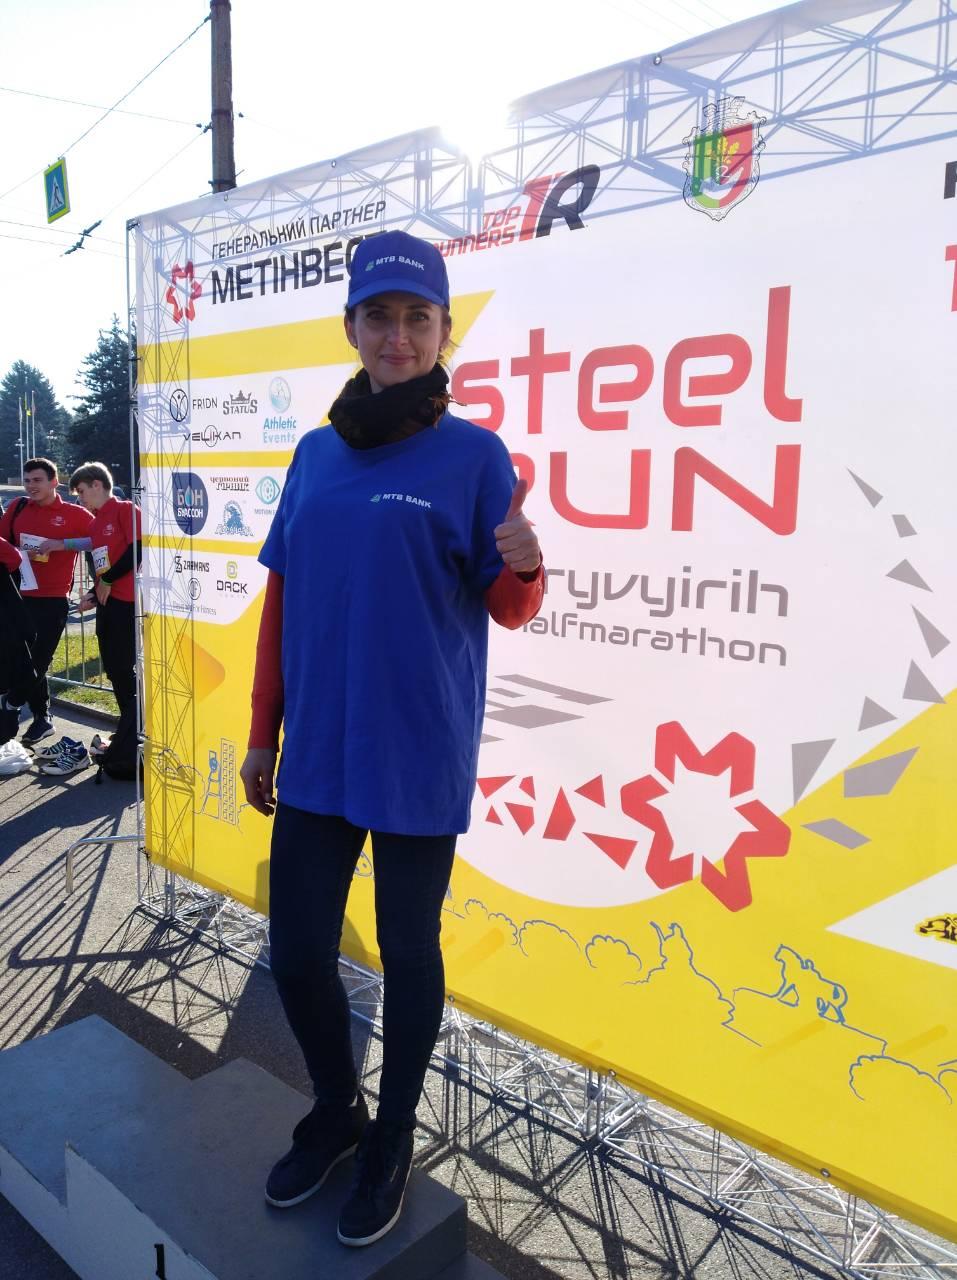 МТБ БАНК принял участие в полумарафоне «Steel Run» - фото 4 - mtb.ua